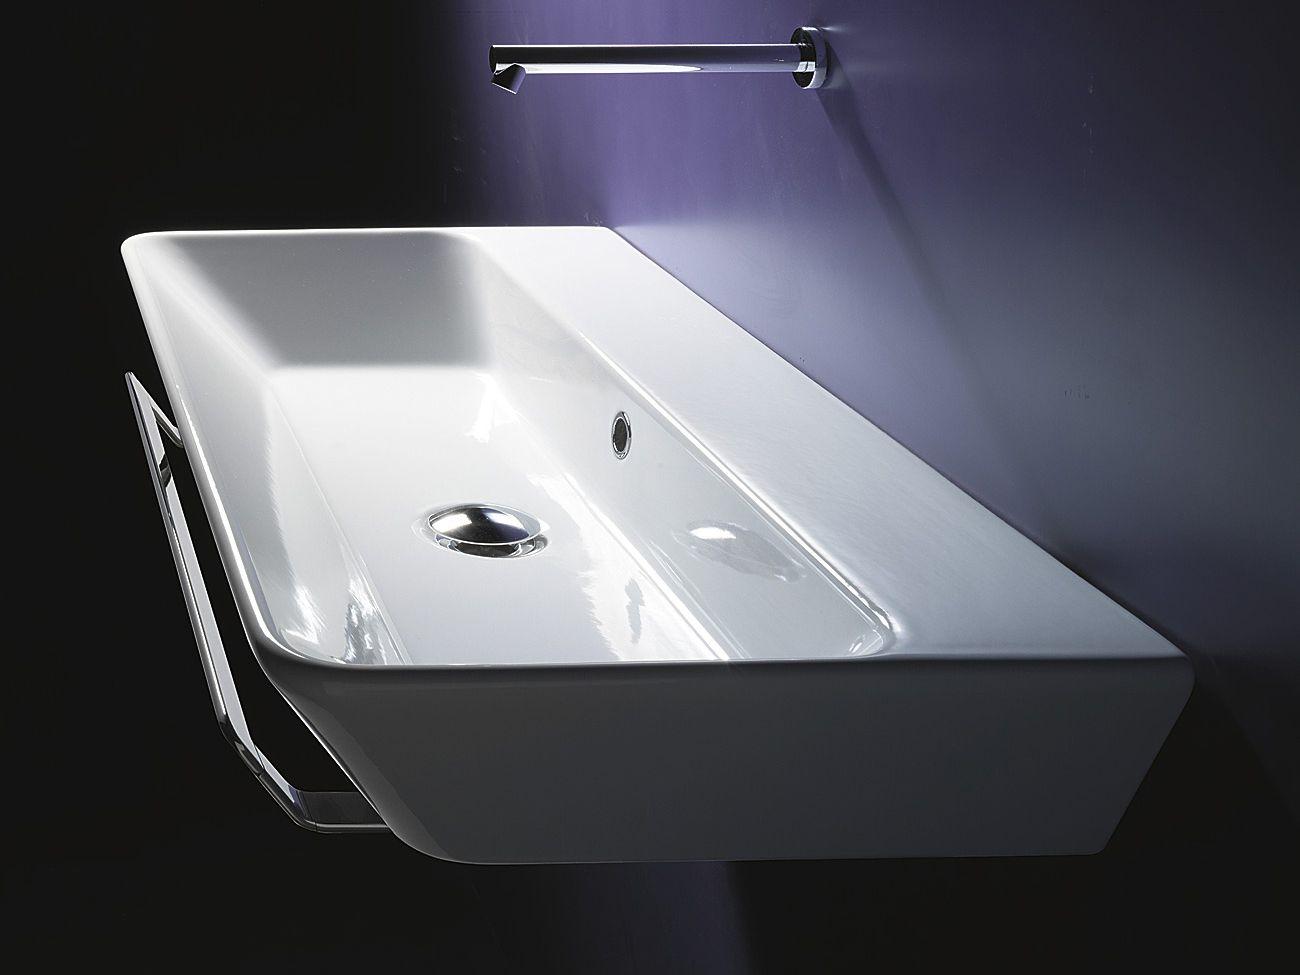 proiezioni 80 waschbecken by ceramica catalano. Black Bedroom Furniture Sets. Home Design Ideas